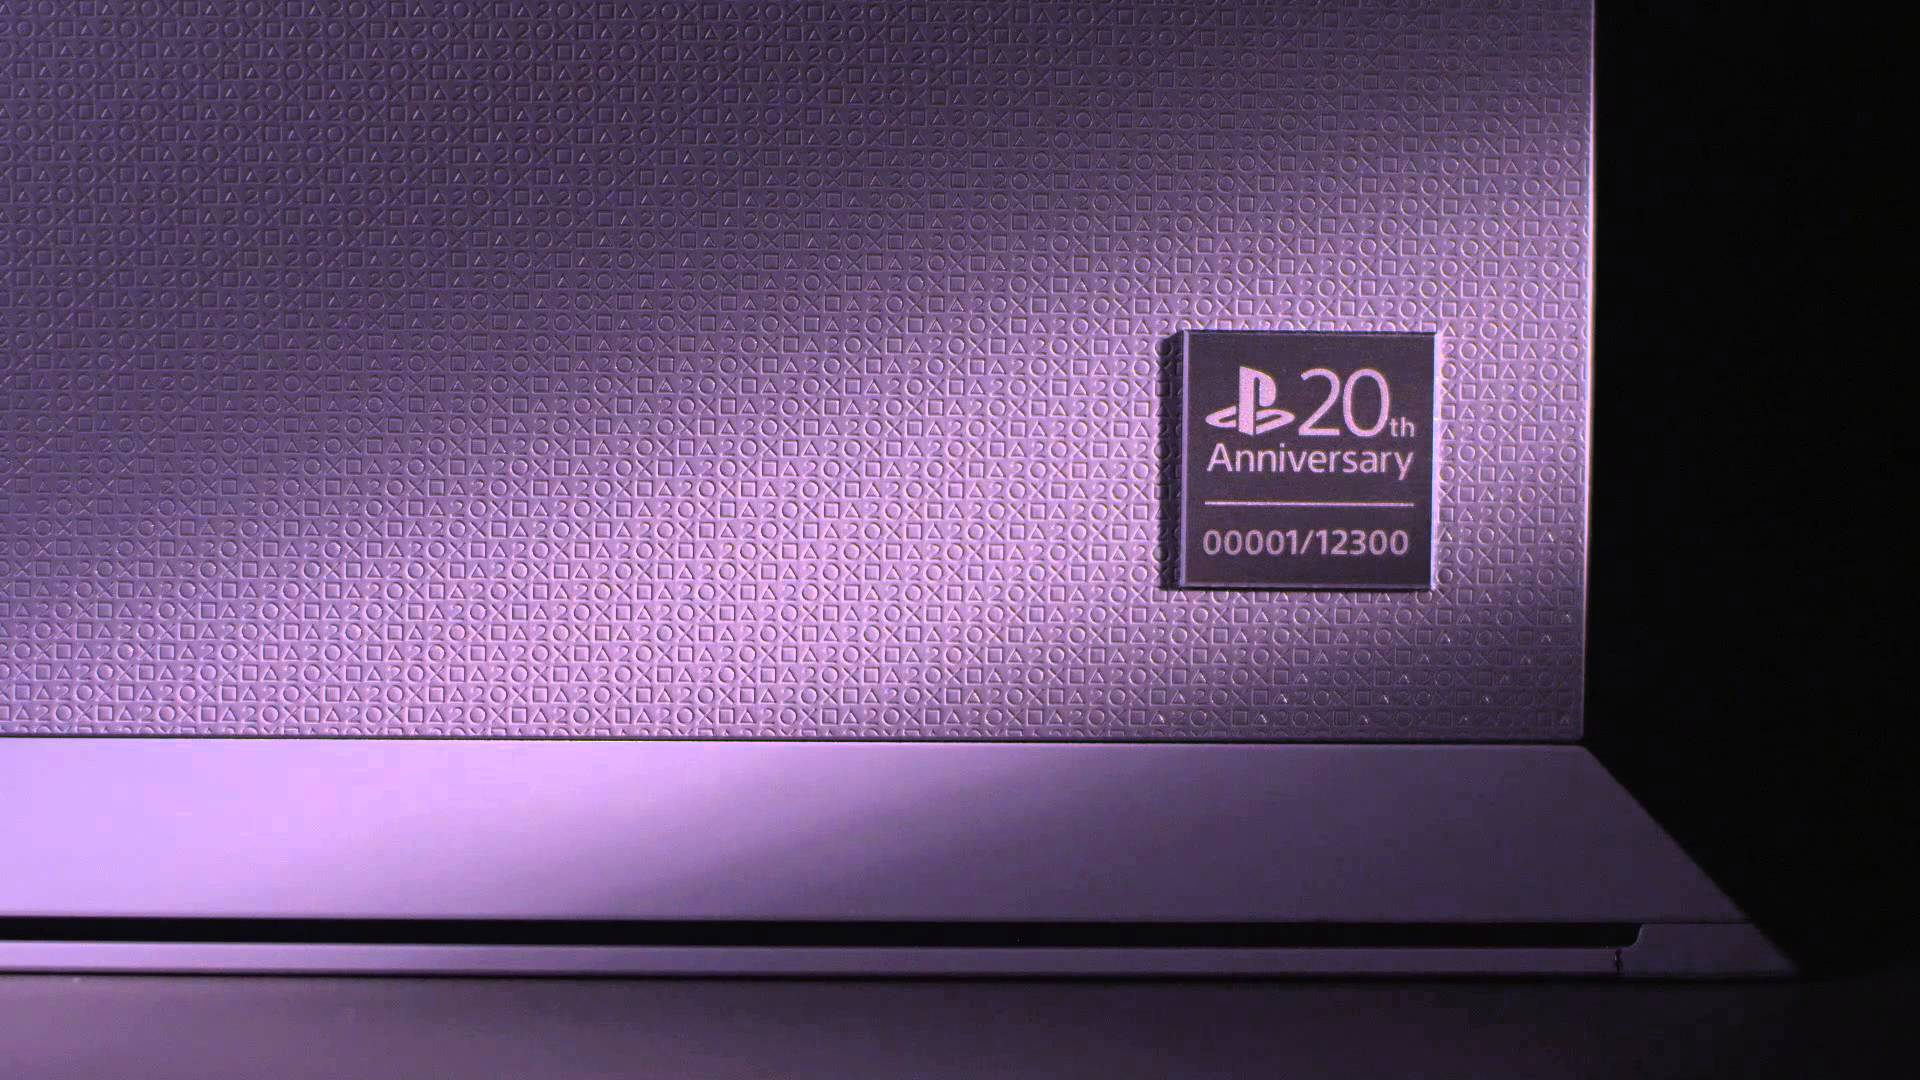 PlayStation wird 20, limitierte PS4 Jubiläums-Edition kommt